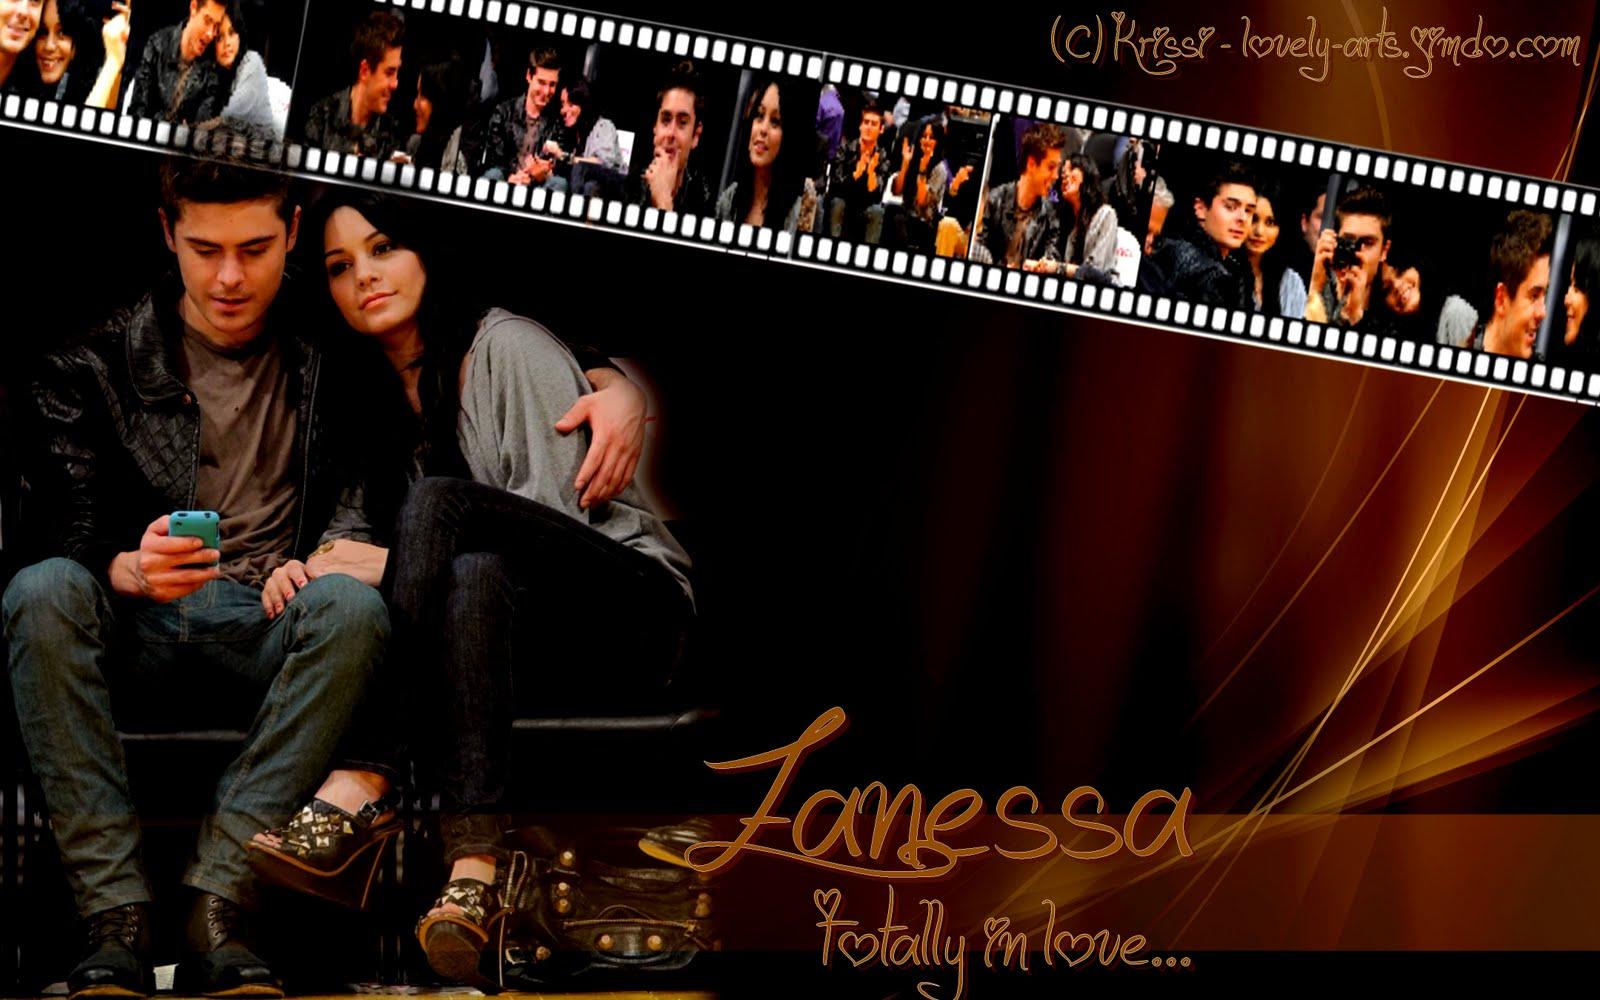 http://2.bp.blogspot.com/_m0UggRMjfdA/S9XCehQ43OI/AAAAAAAAFso/_FG7xK2-Tfs/s1600/Walli+Totally+in+Love.jpg